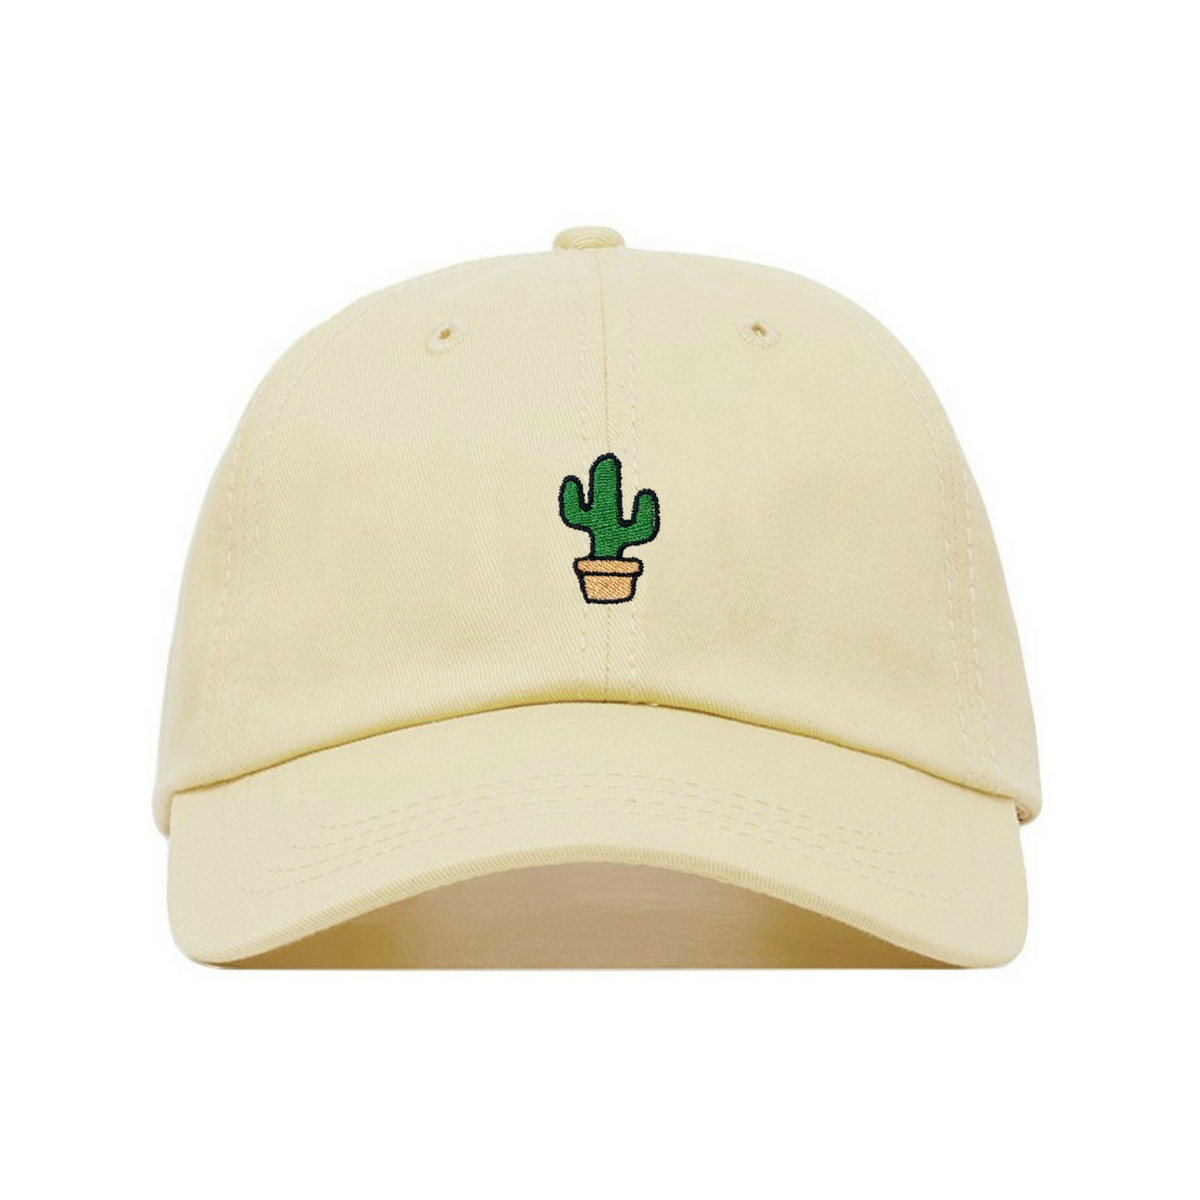 f98a9d01fa82b1 Cactus in 2019 | Cactus | Hats, Dad hats, Cactus hat